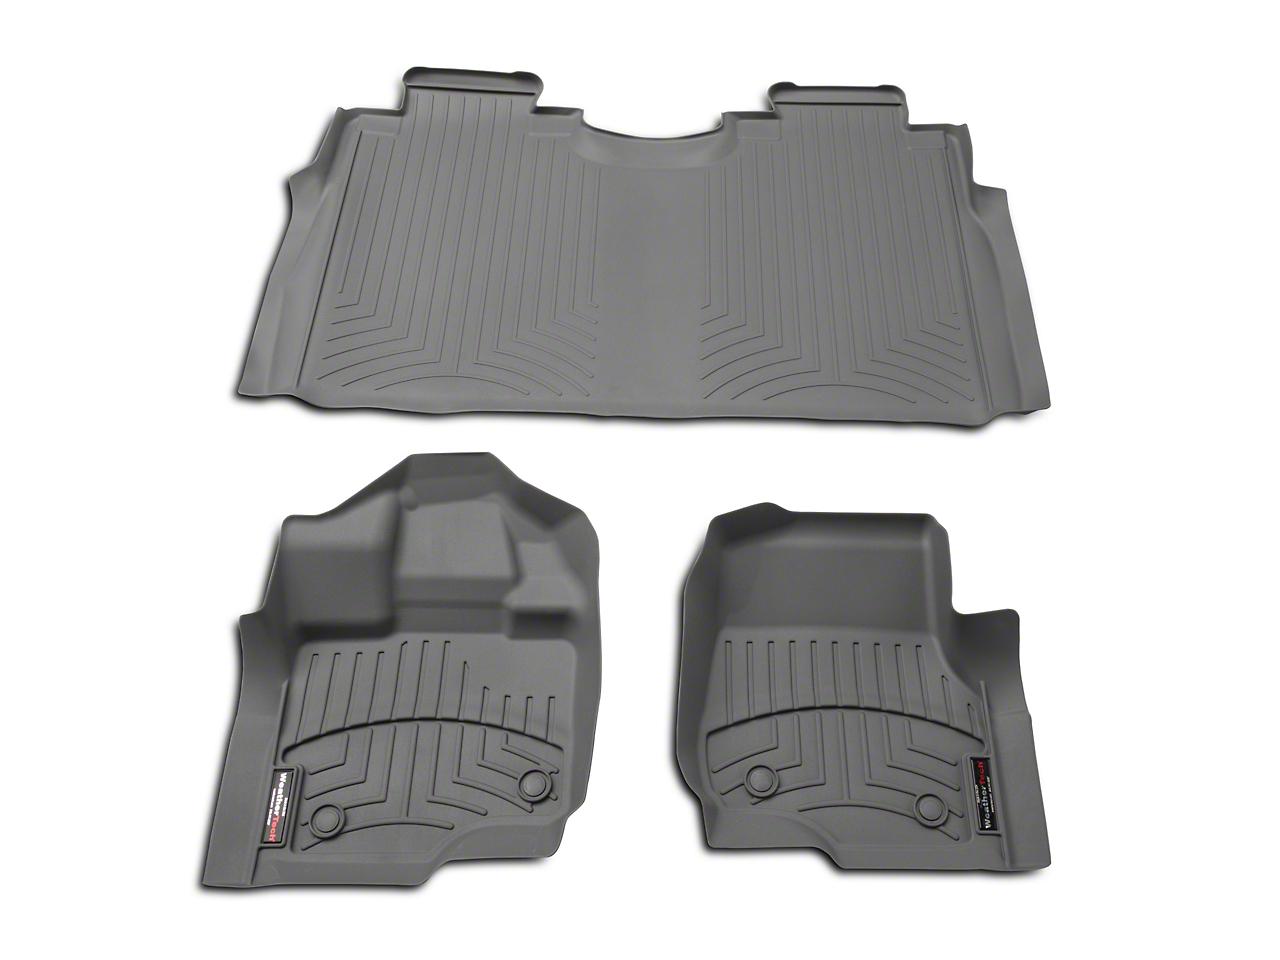 Weathertech DigitalFit Front & Rear Floor Liners - Gray (15-18 SuperCab, SuperCrew)